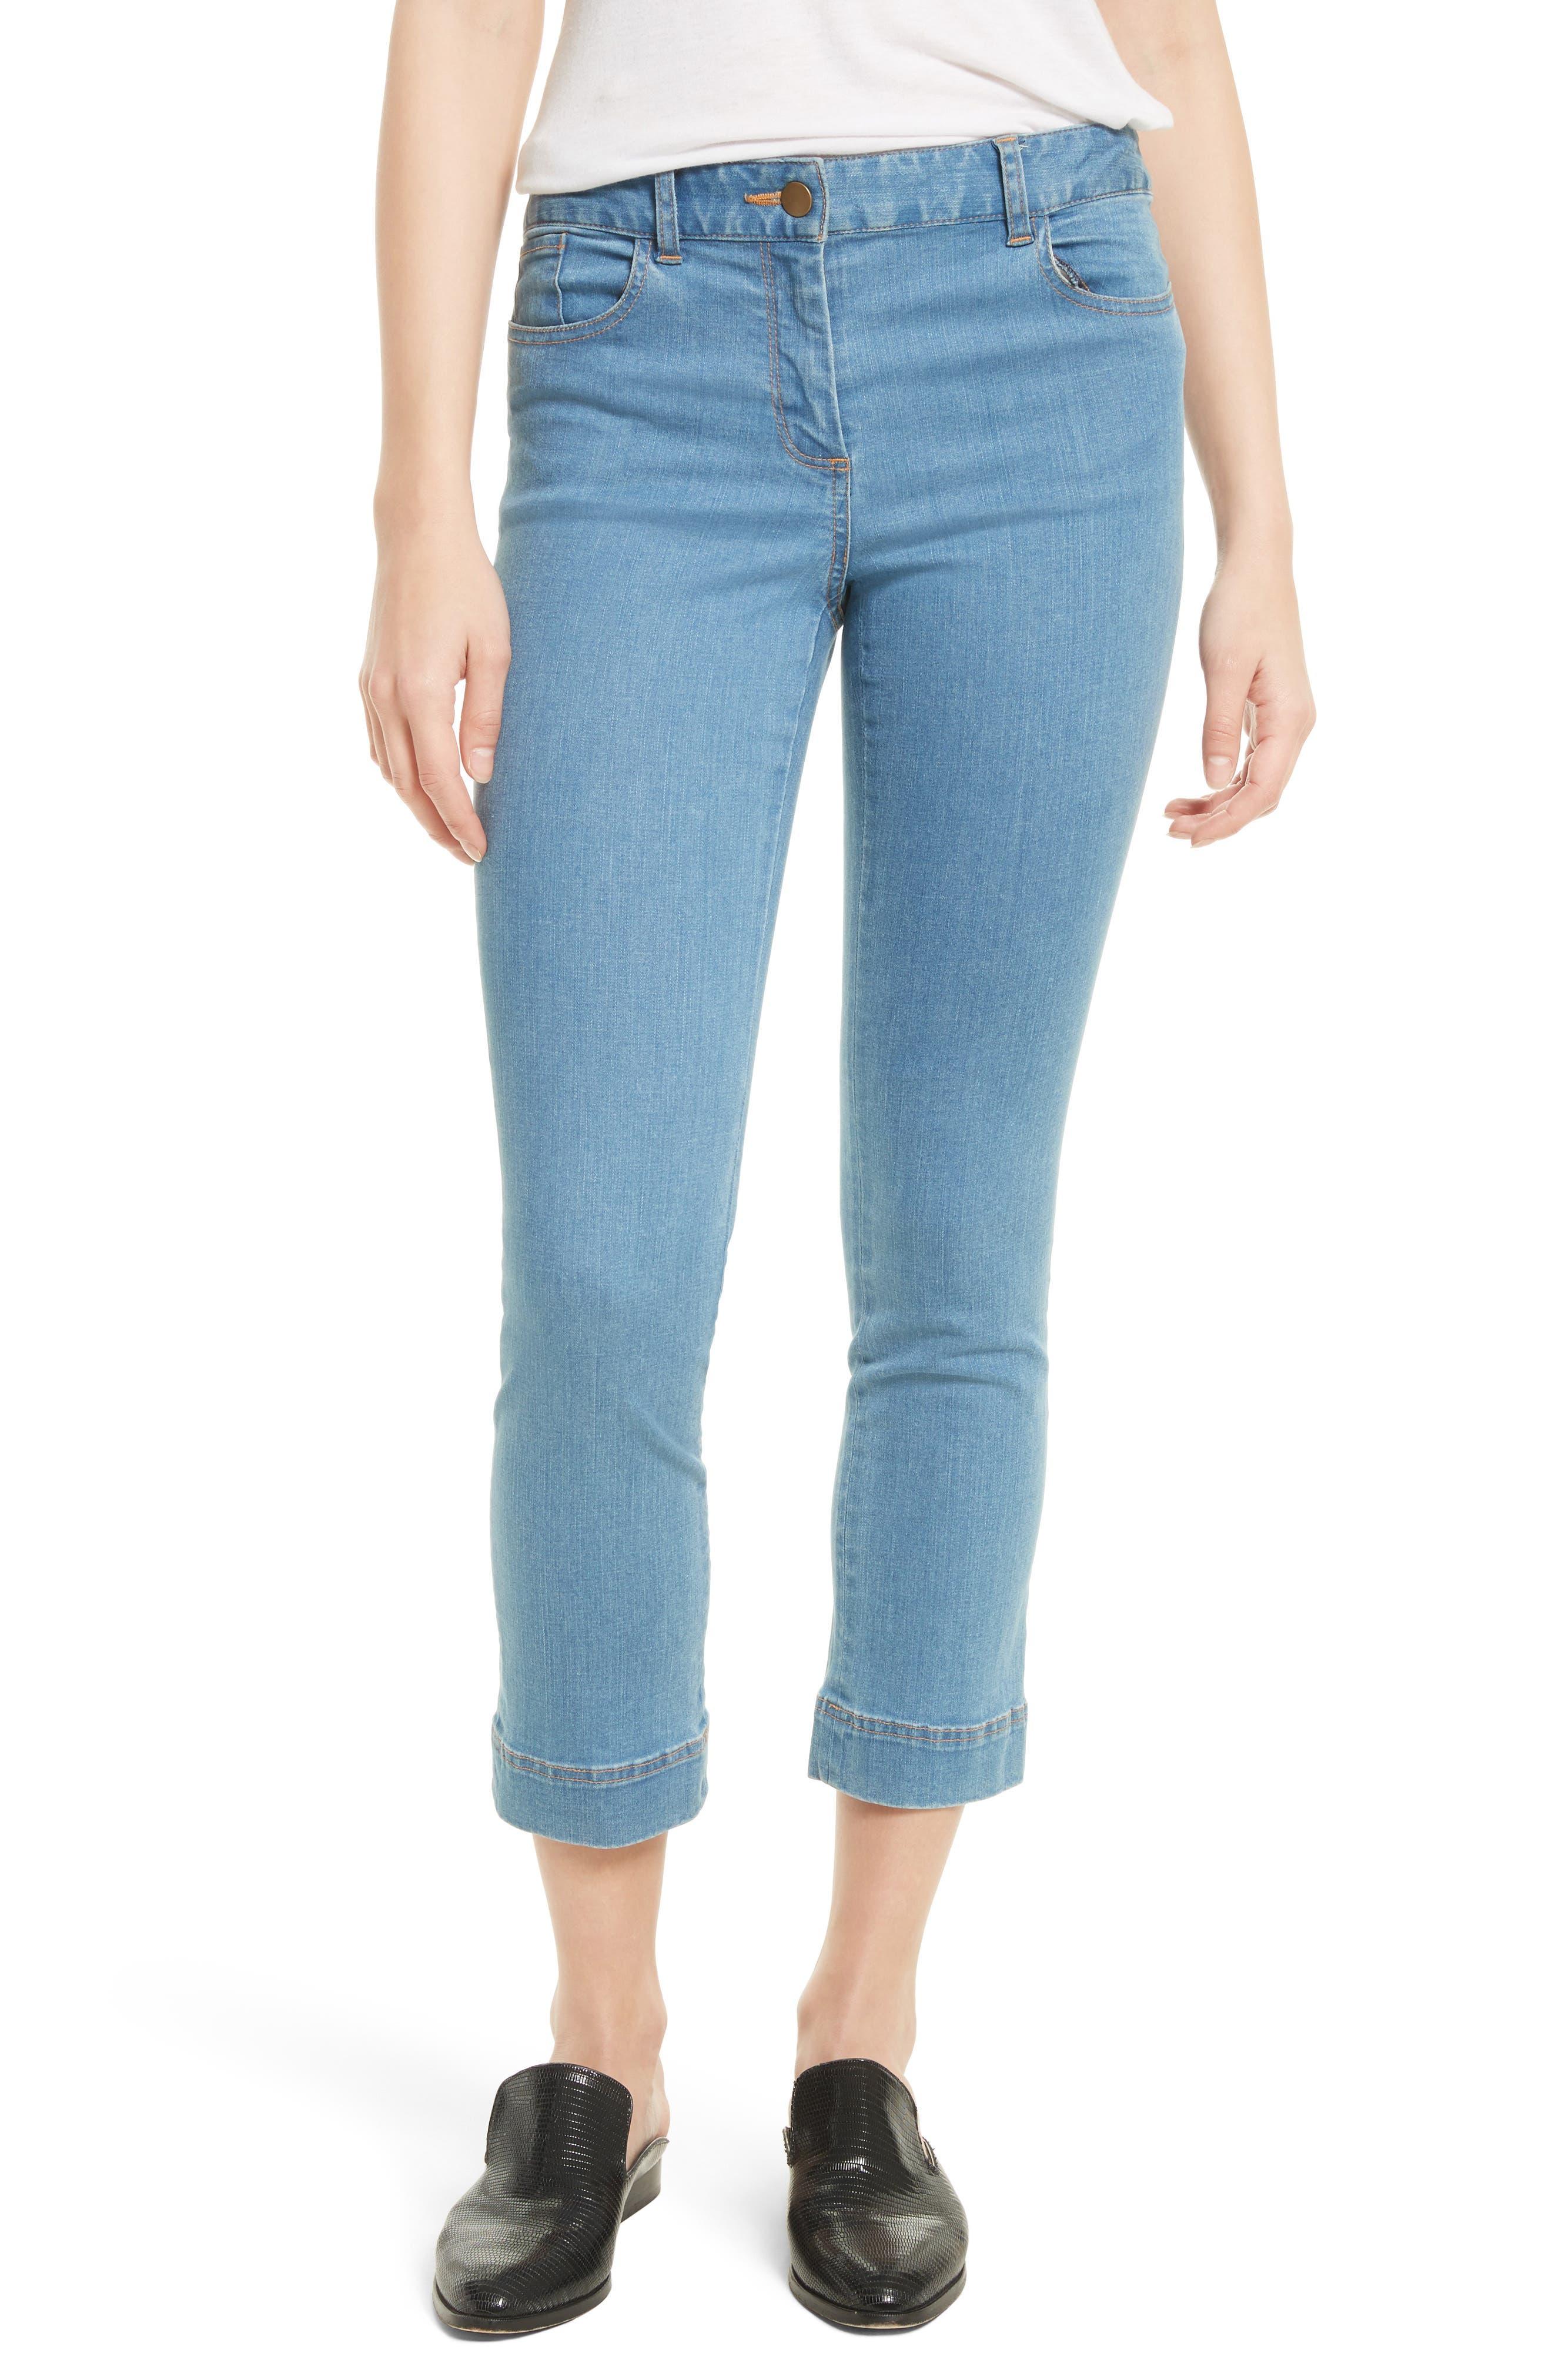 Veronica Beard Gia Crop Baby Kick Jeans